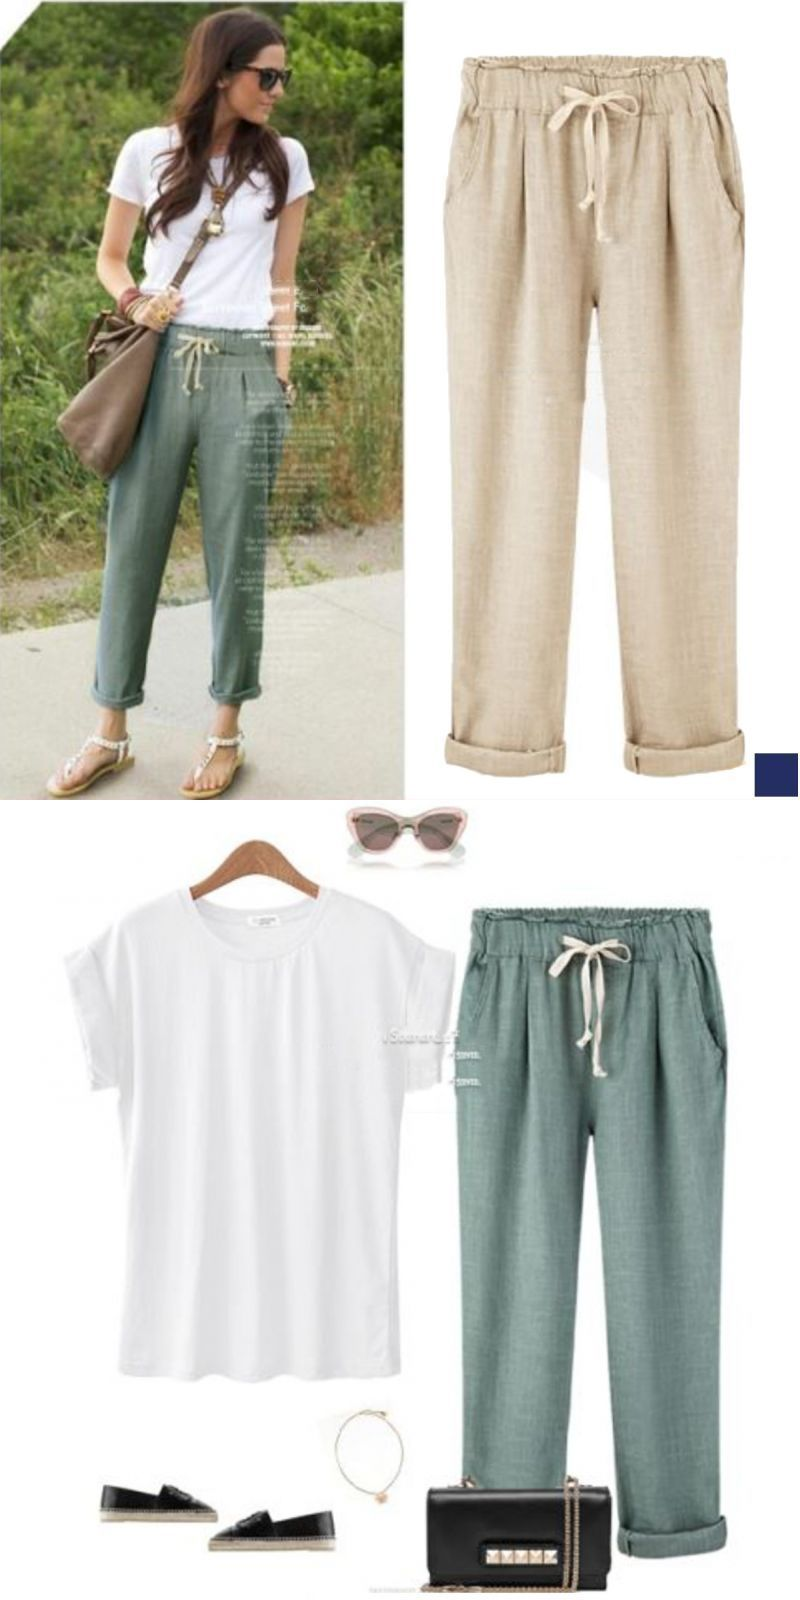 f9fc35be95df93 Elastic waist breathable cotton pants in 3 colors yoga capris for women  #cotton #ankle